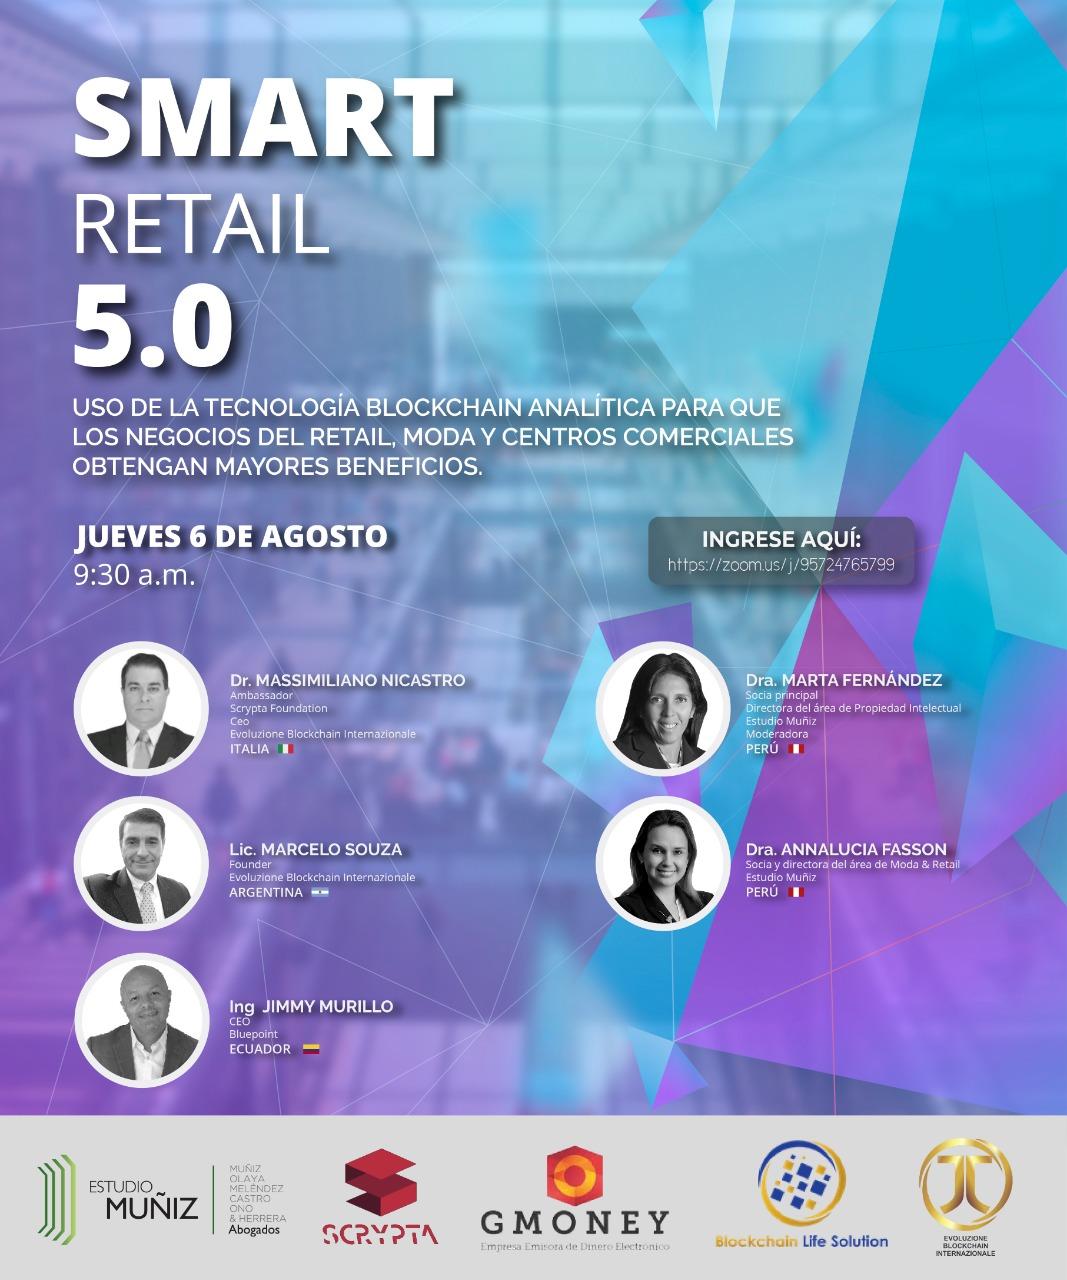 Smart Retail 5.0